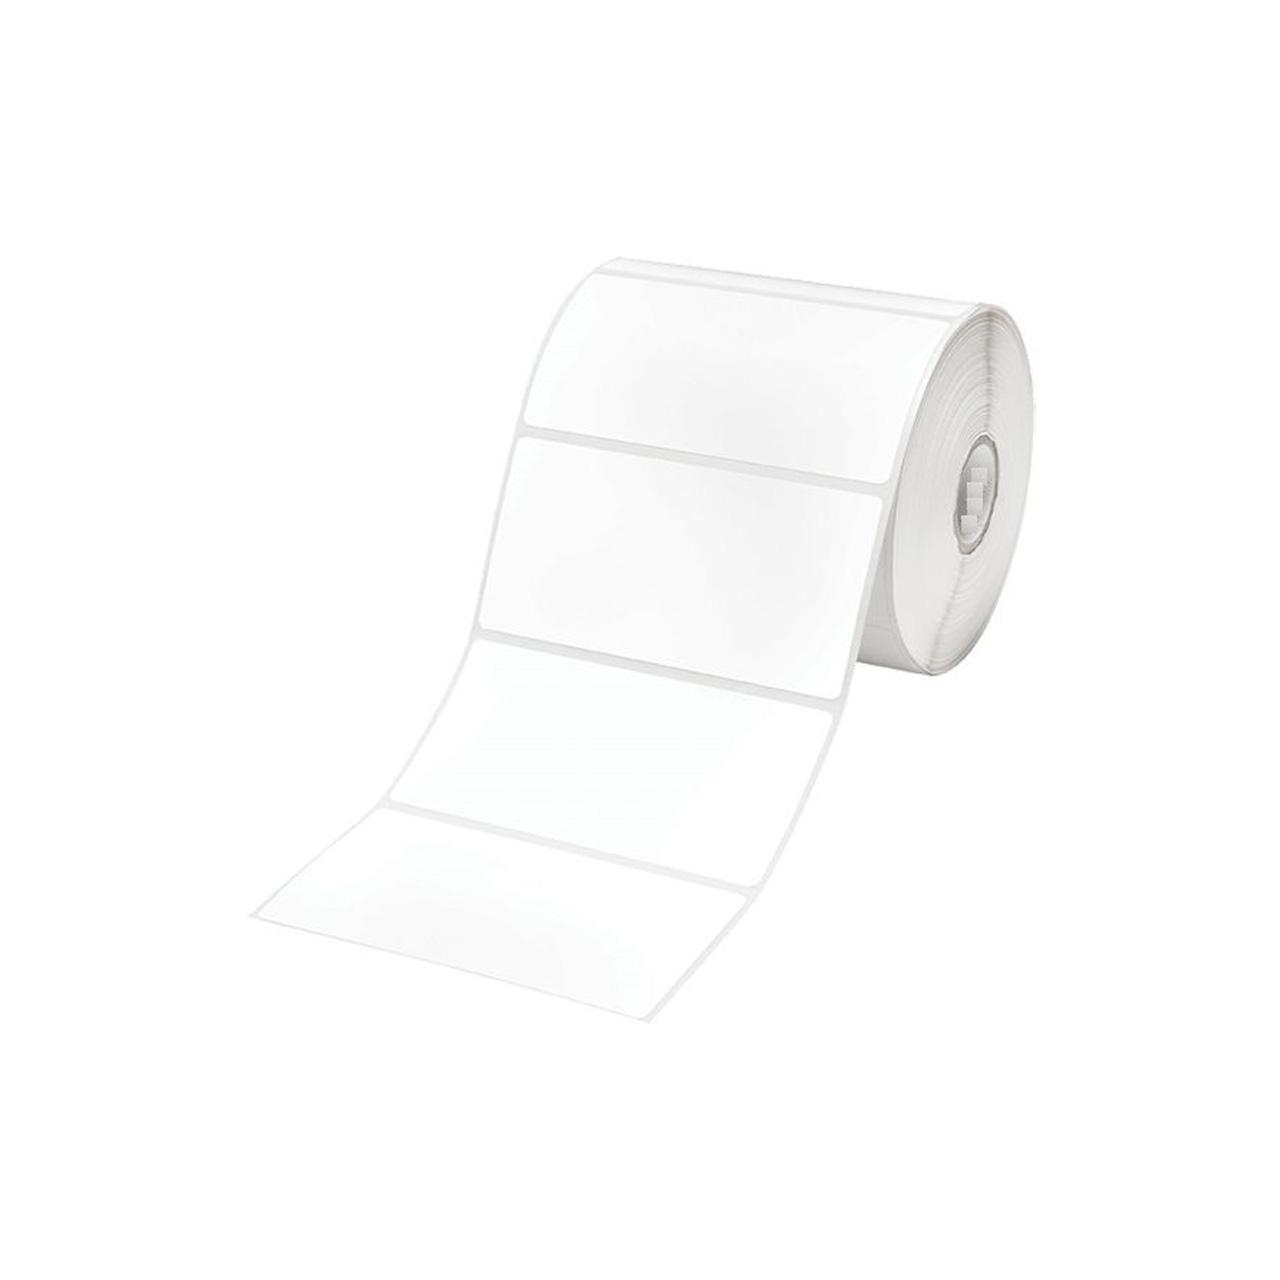 برچسب پرینتر لیبل زن اپسون مدل High Gloss Label  Die-cut Roll 76mm x 51mm